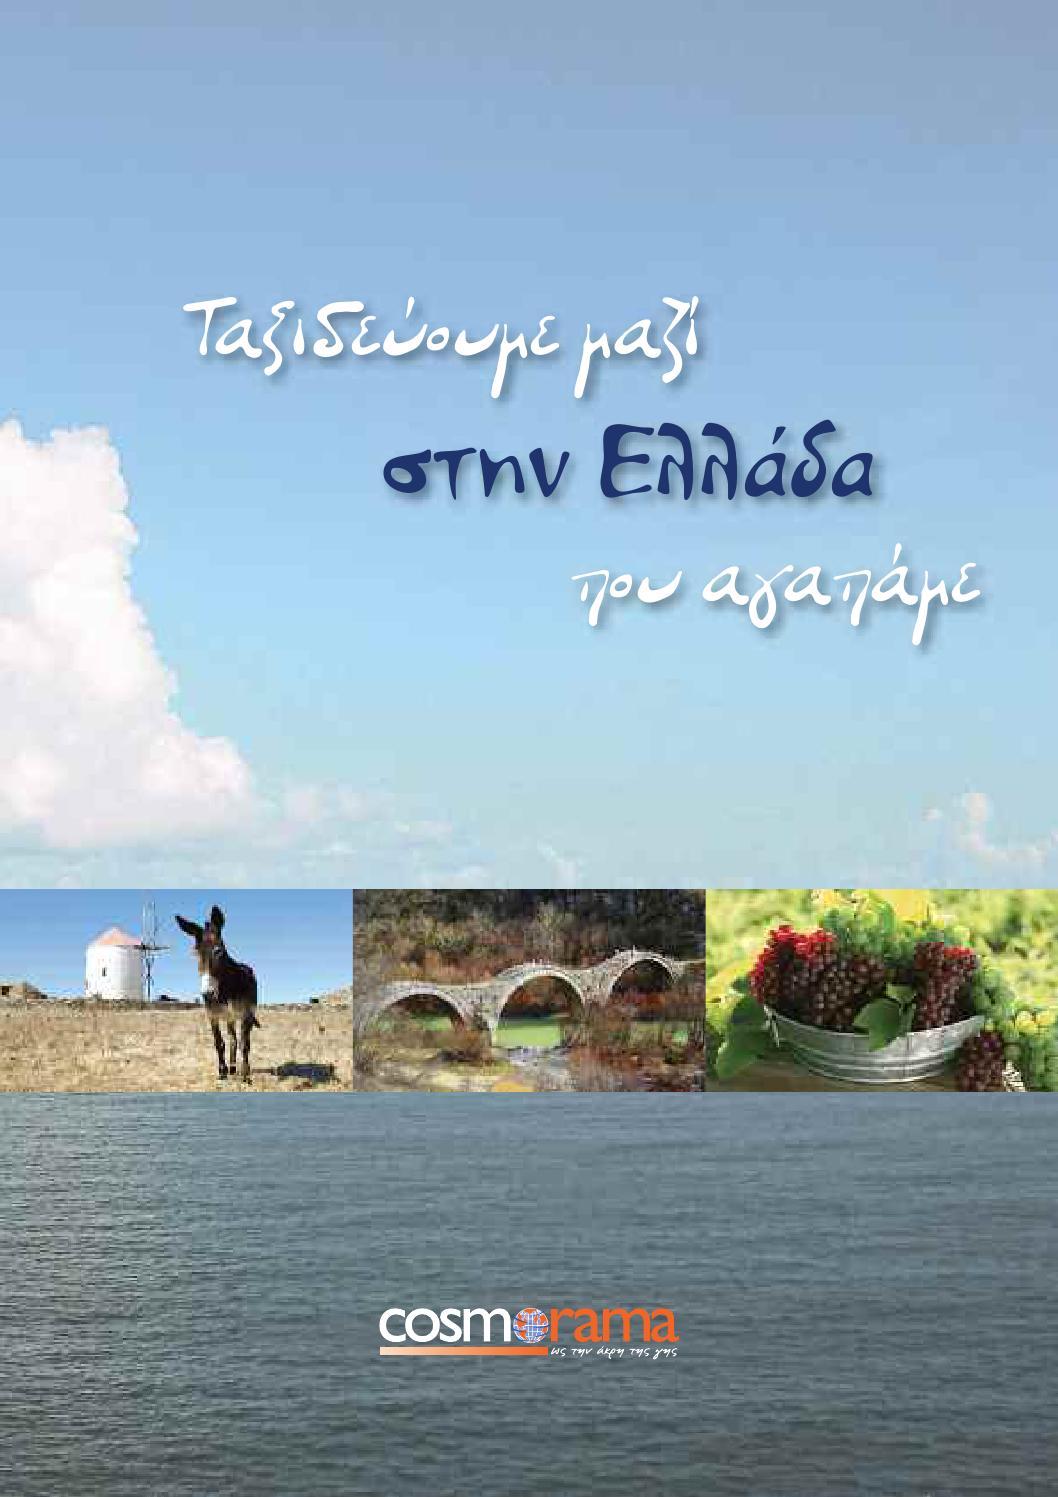 7dbabec9e89 Ταξιδεύουμε μαζί στην Ελλάδα που αγαπάμε by Cosmorama Travel & Tours - issuu